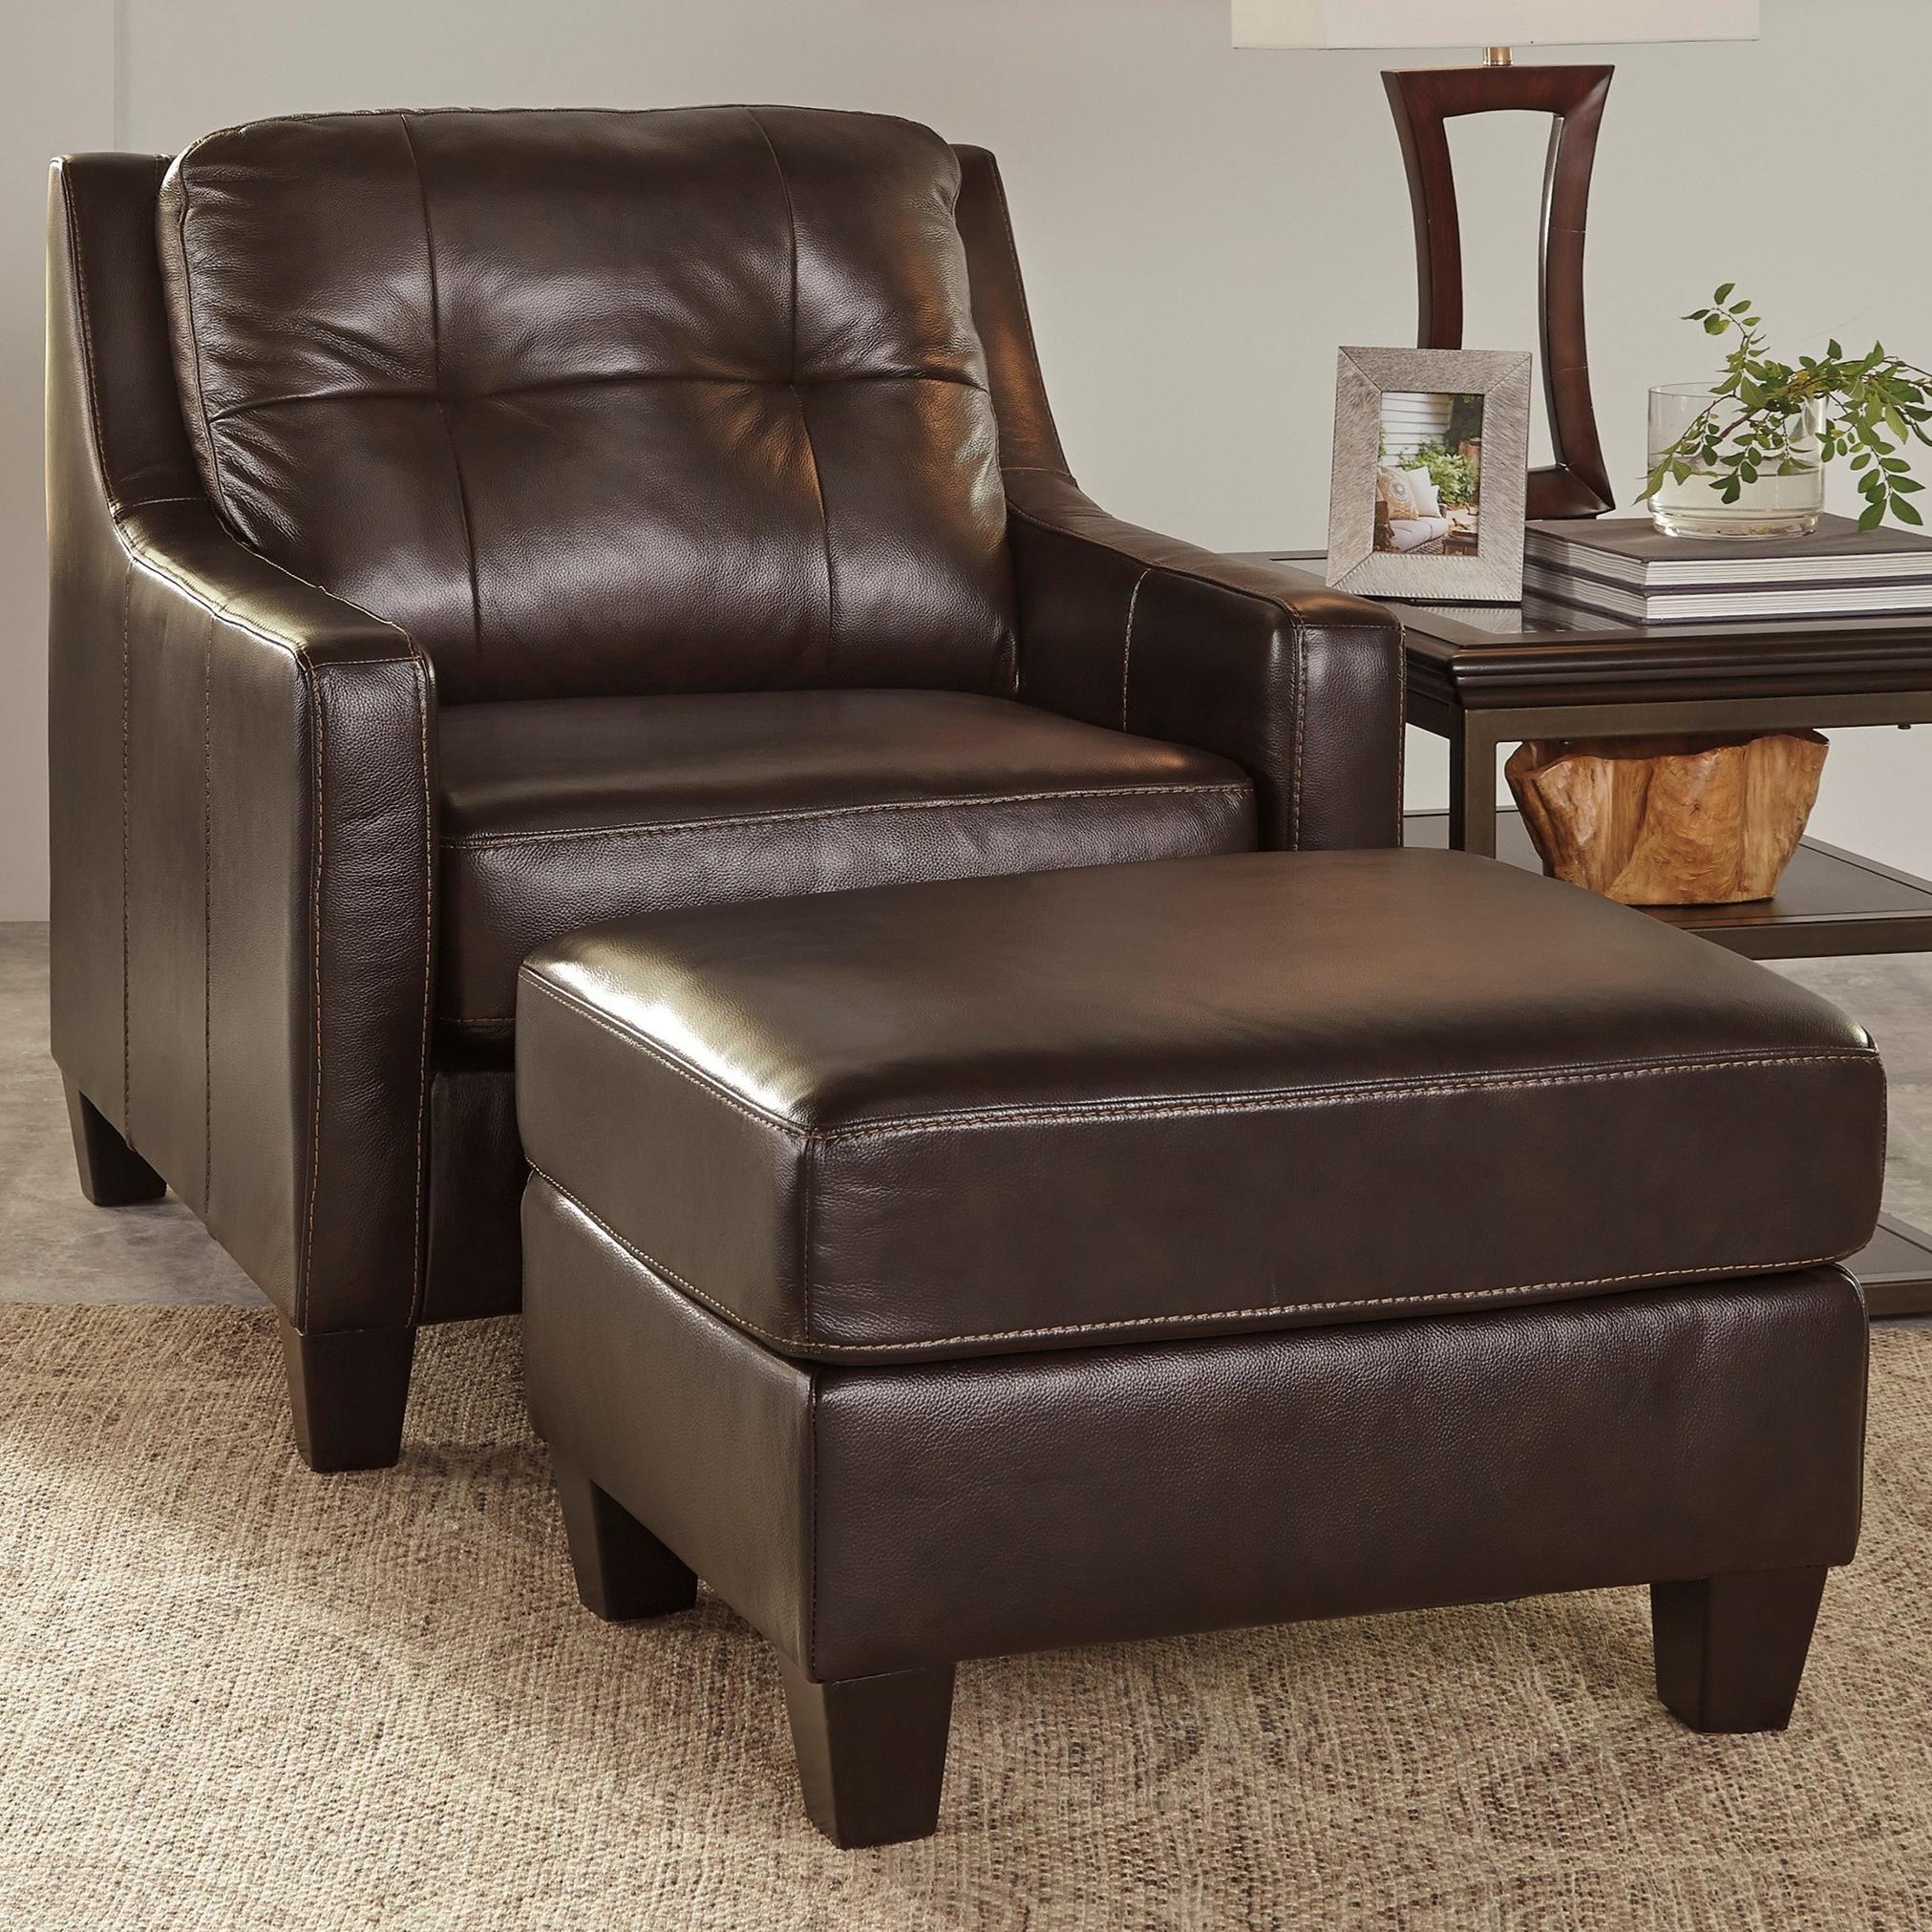 Beau Signature Design By Ashley Ou0027Kean Contemporary Leather Match Chair U0026 Ottoman